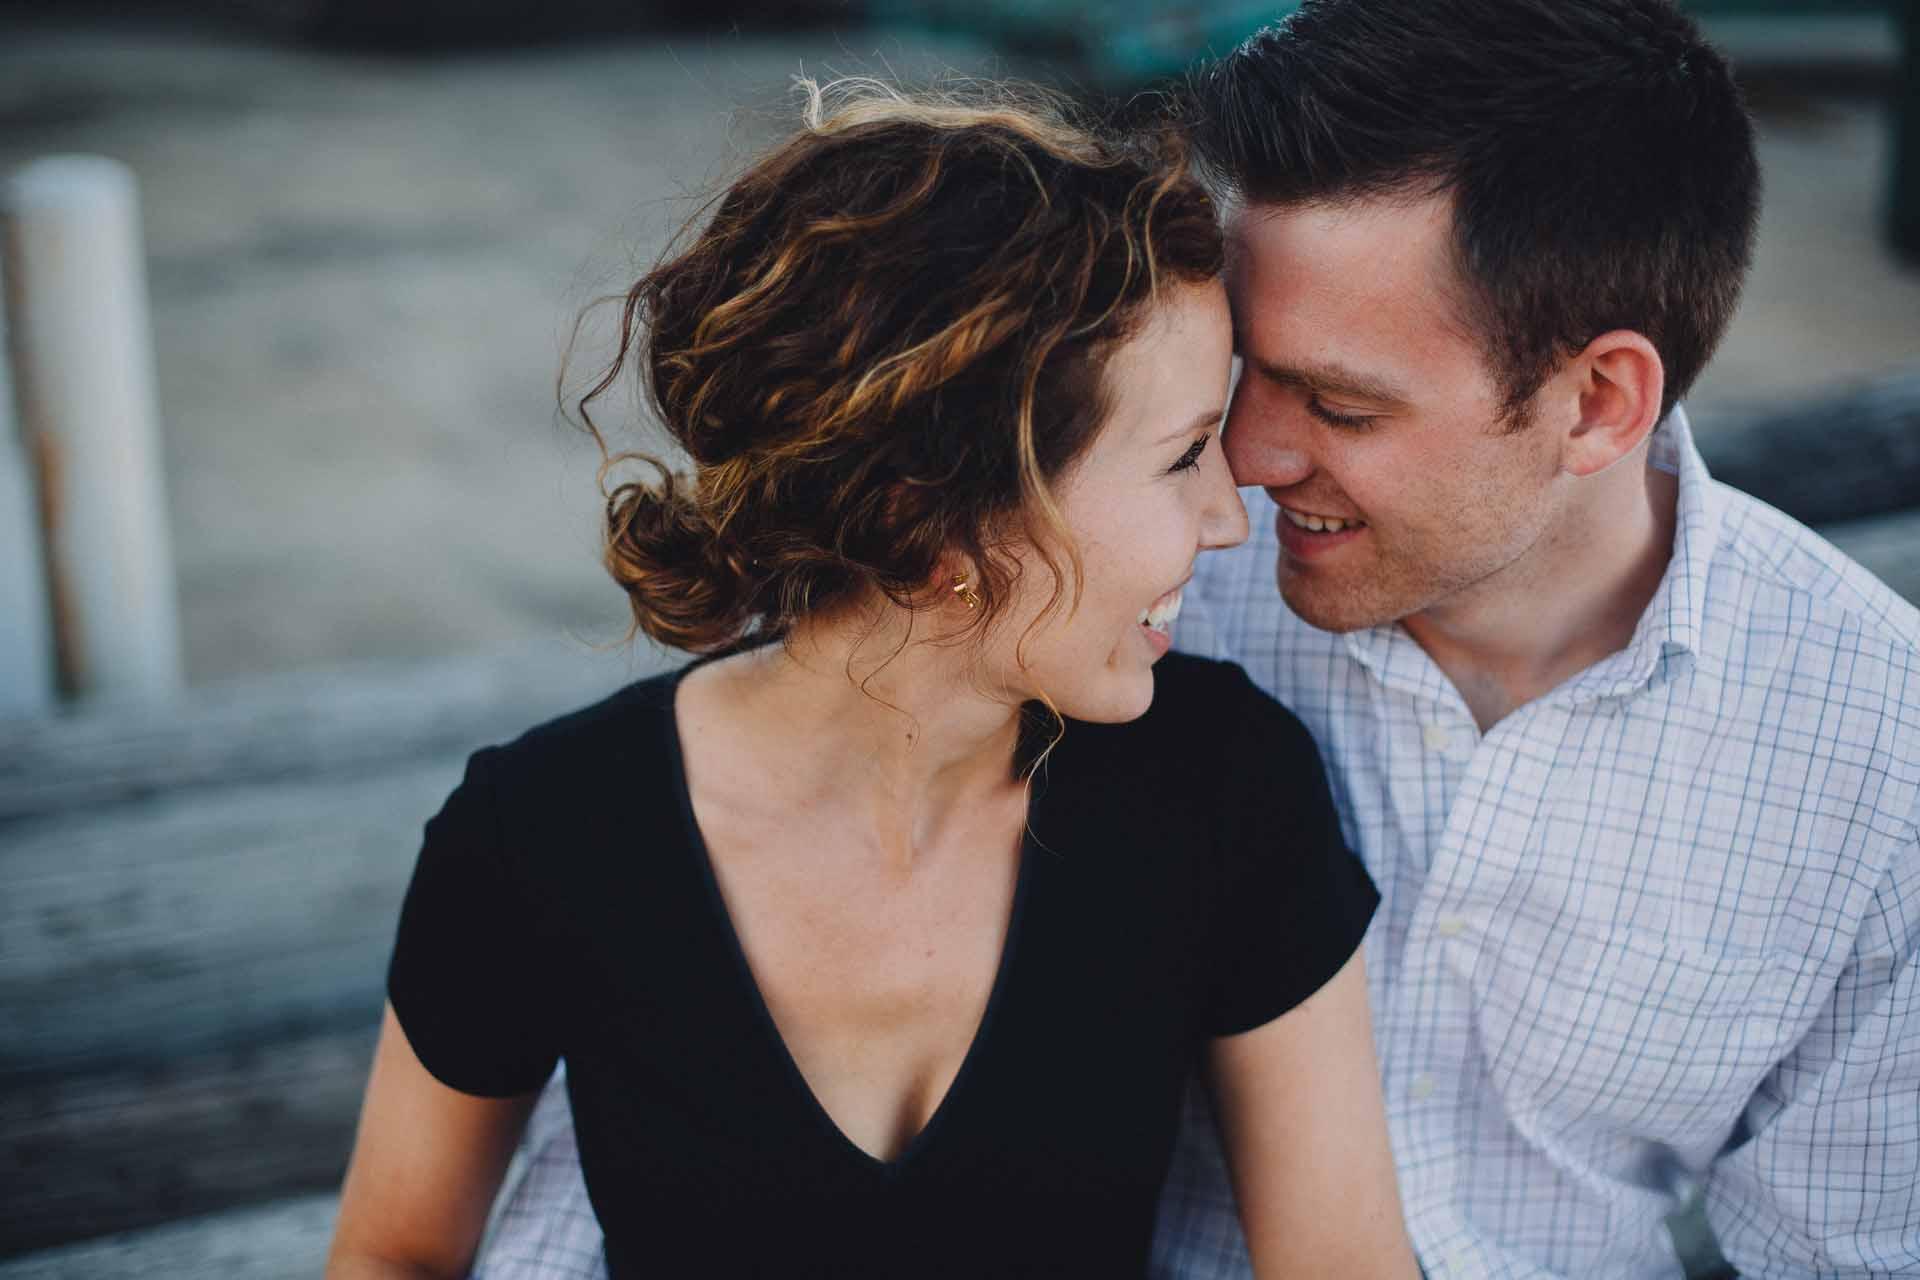 Emily-Dan-Dayton-Engagement-024@2x.jpg